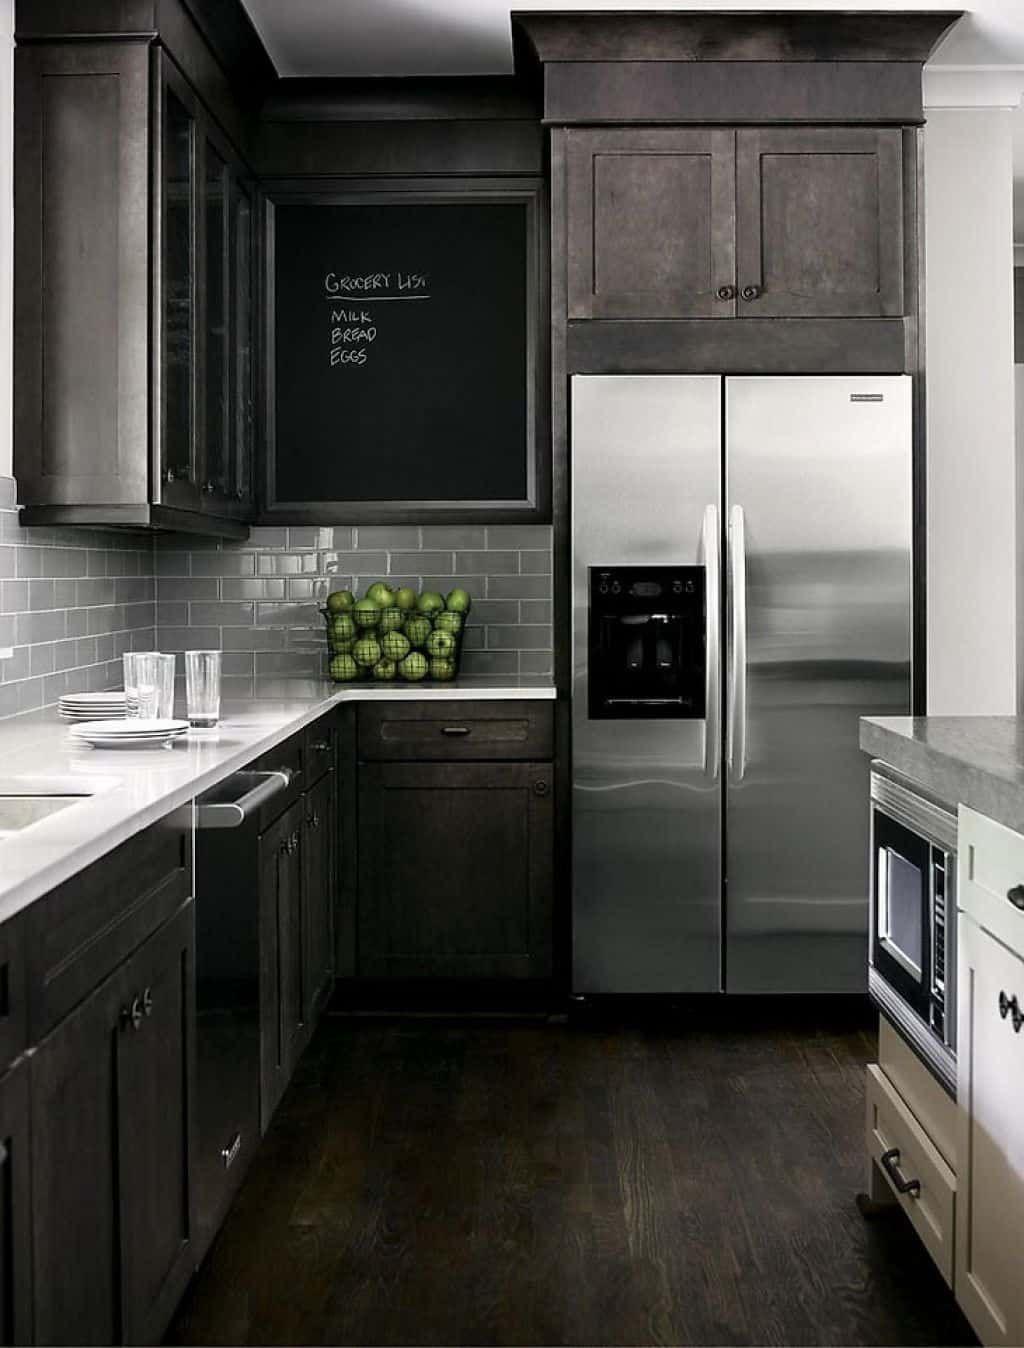 Choosing Stainless Steel Appliances   Backsplash with dark ...